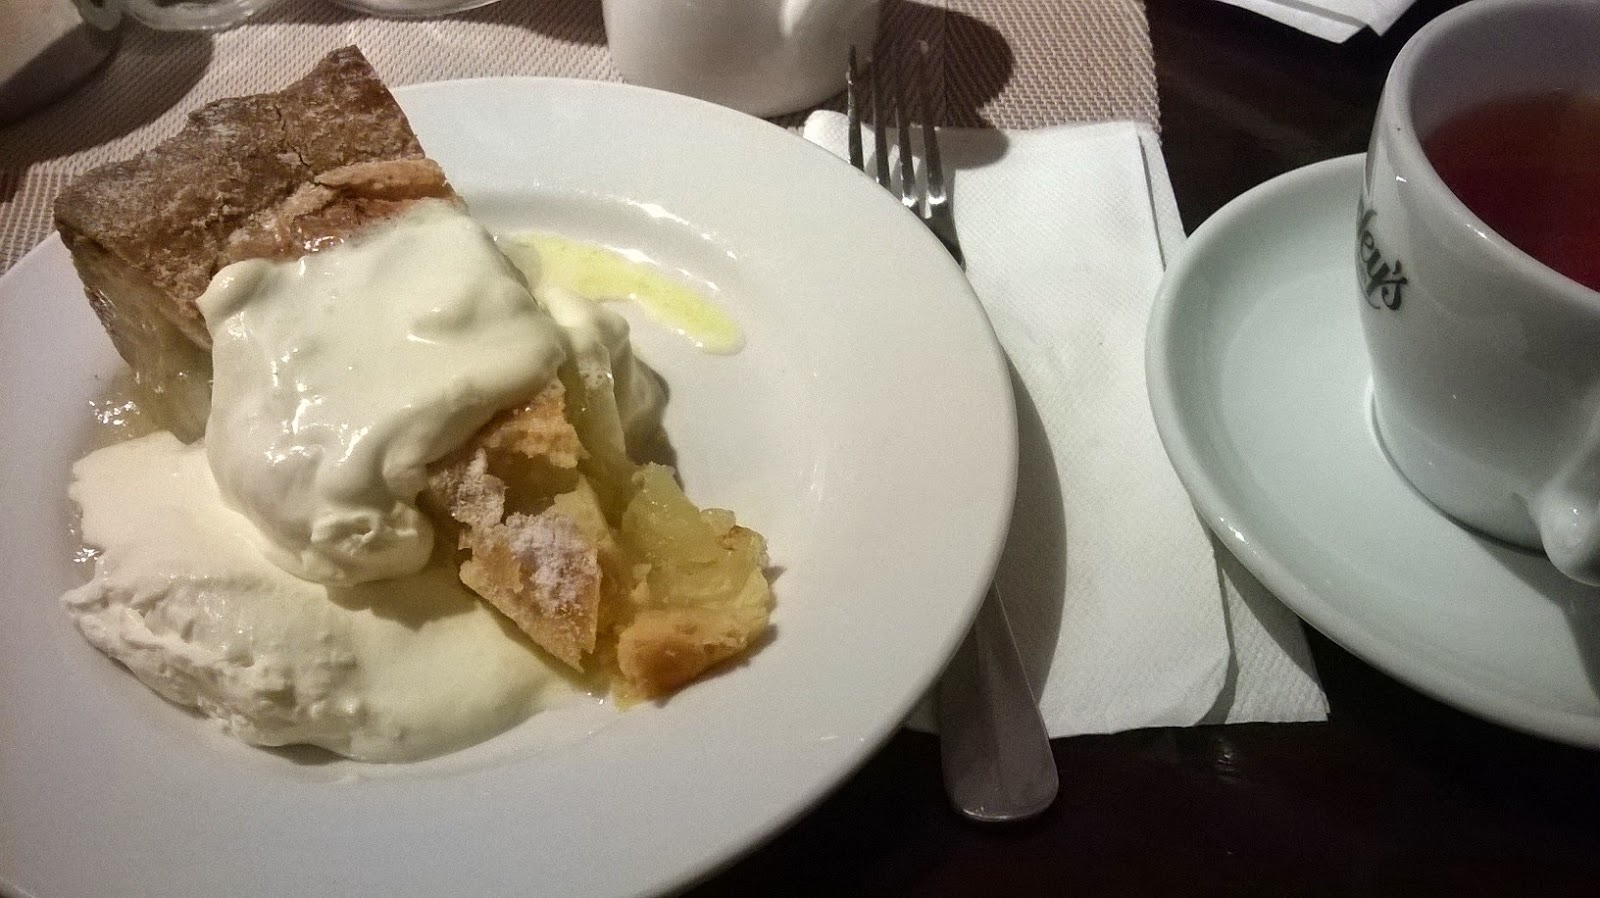 Torta di mele calda con panna montata e un thè inglese